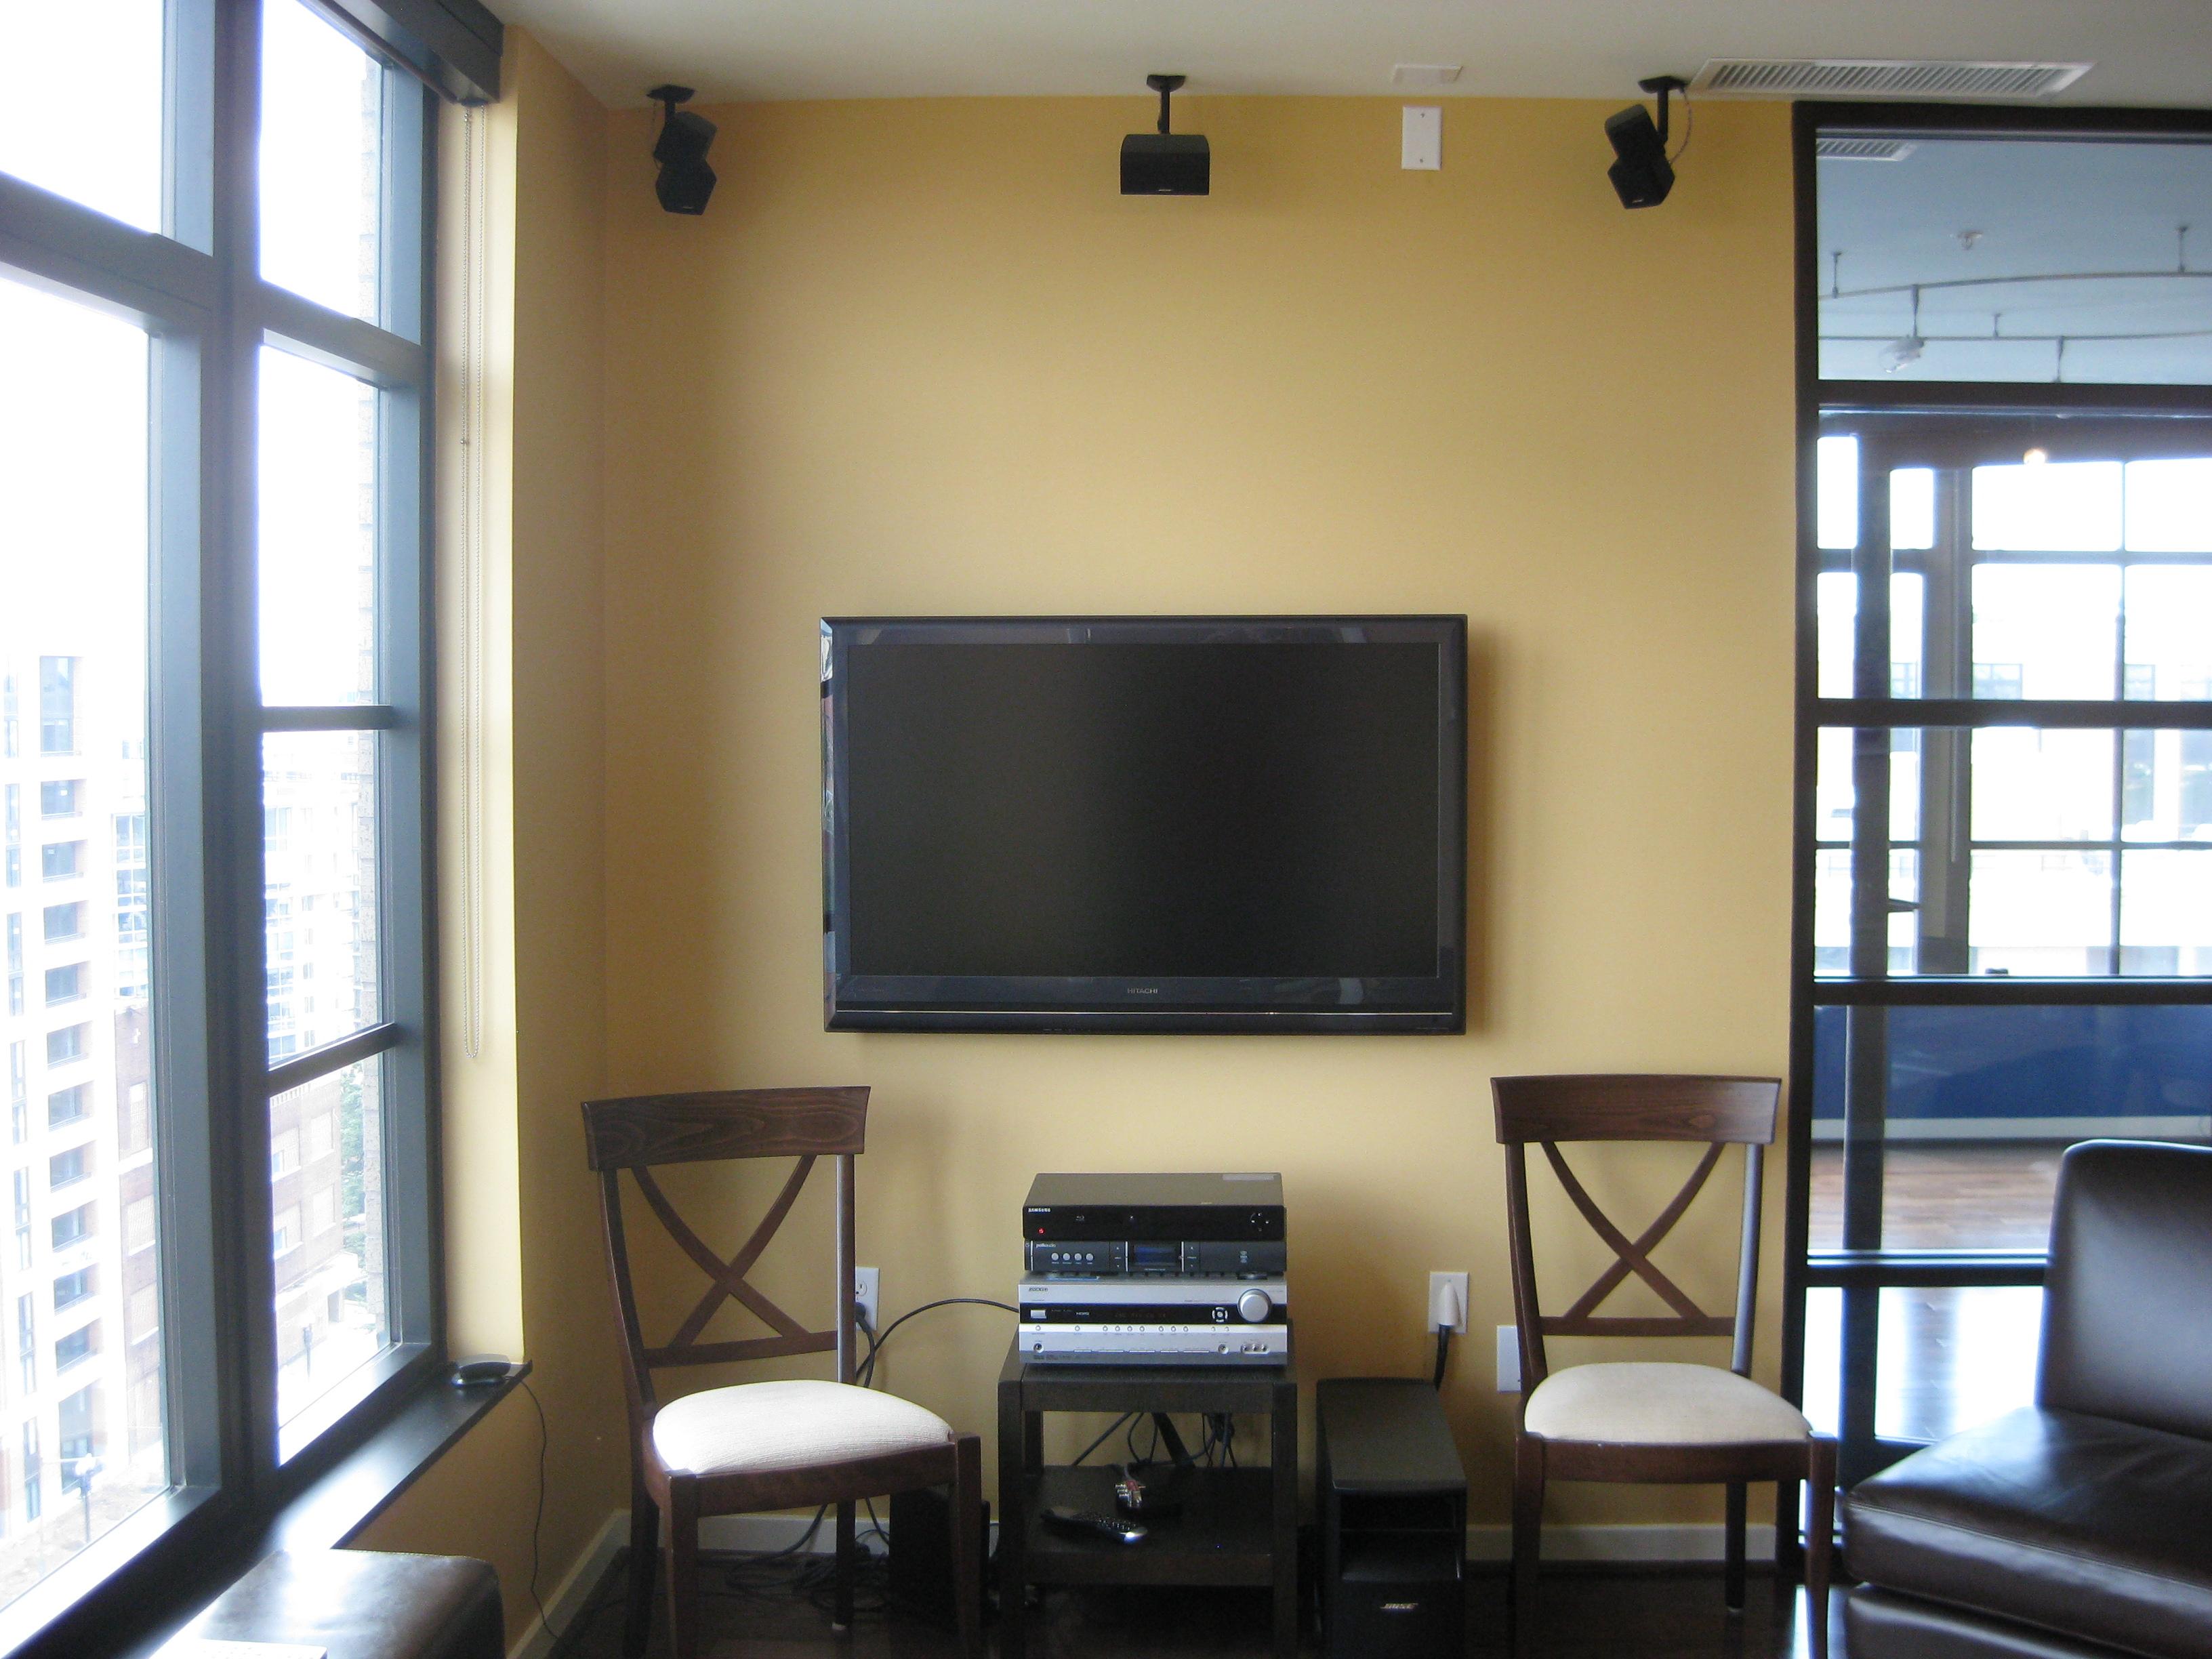 Living Room Surround Sound - Nakicphotography